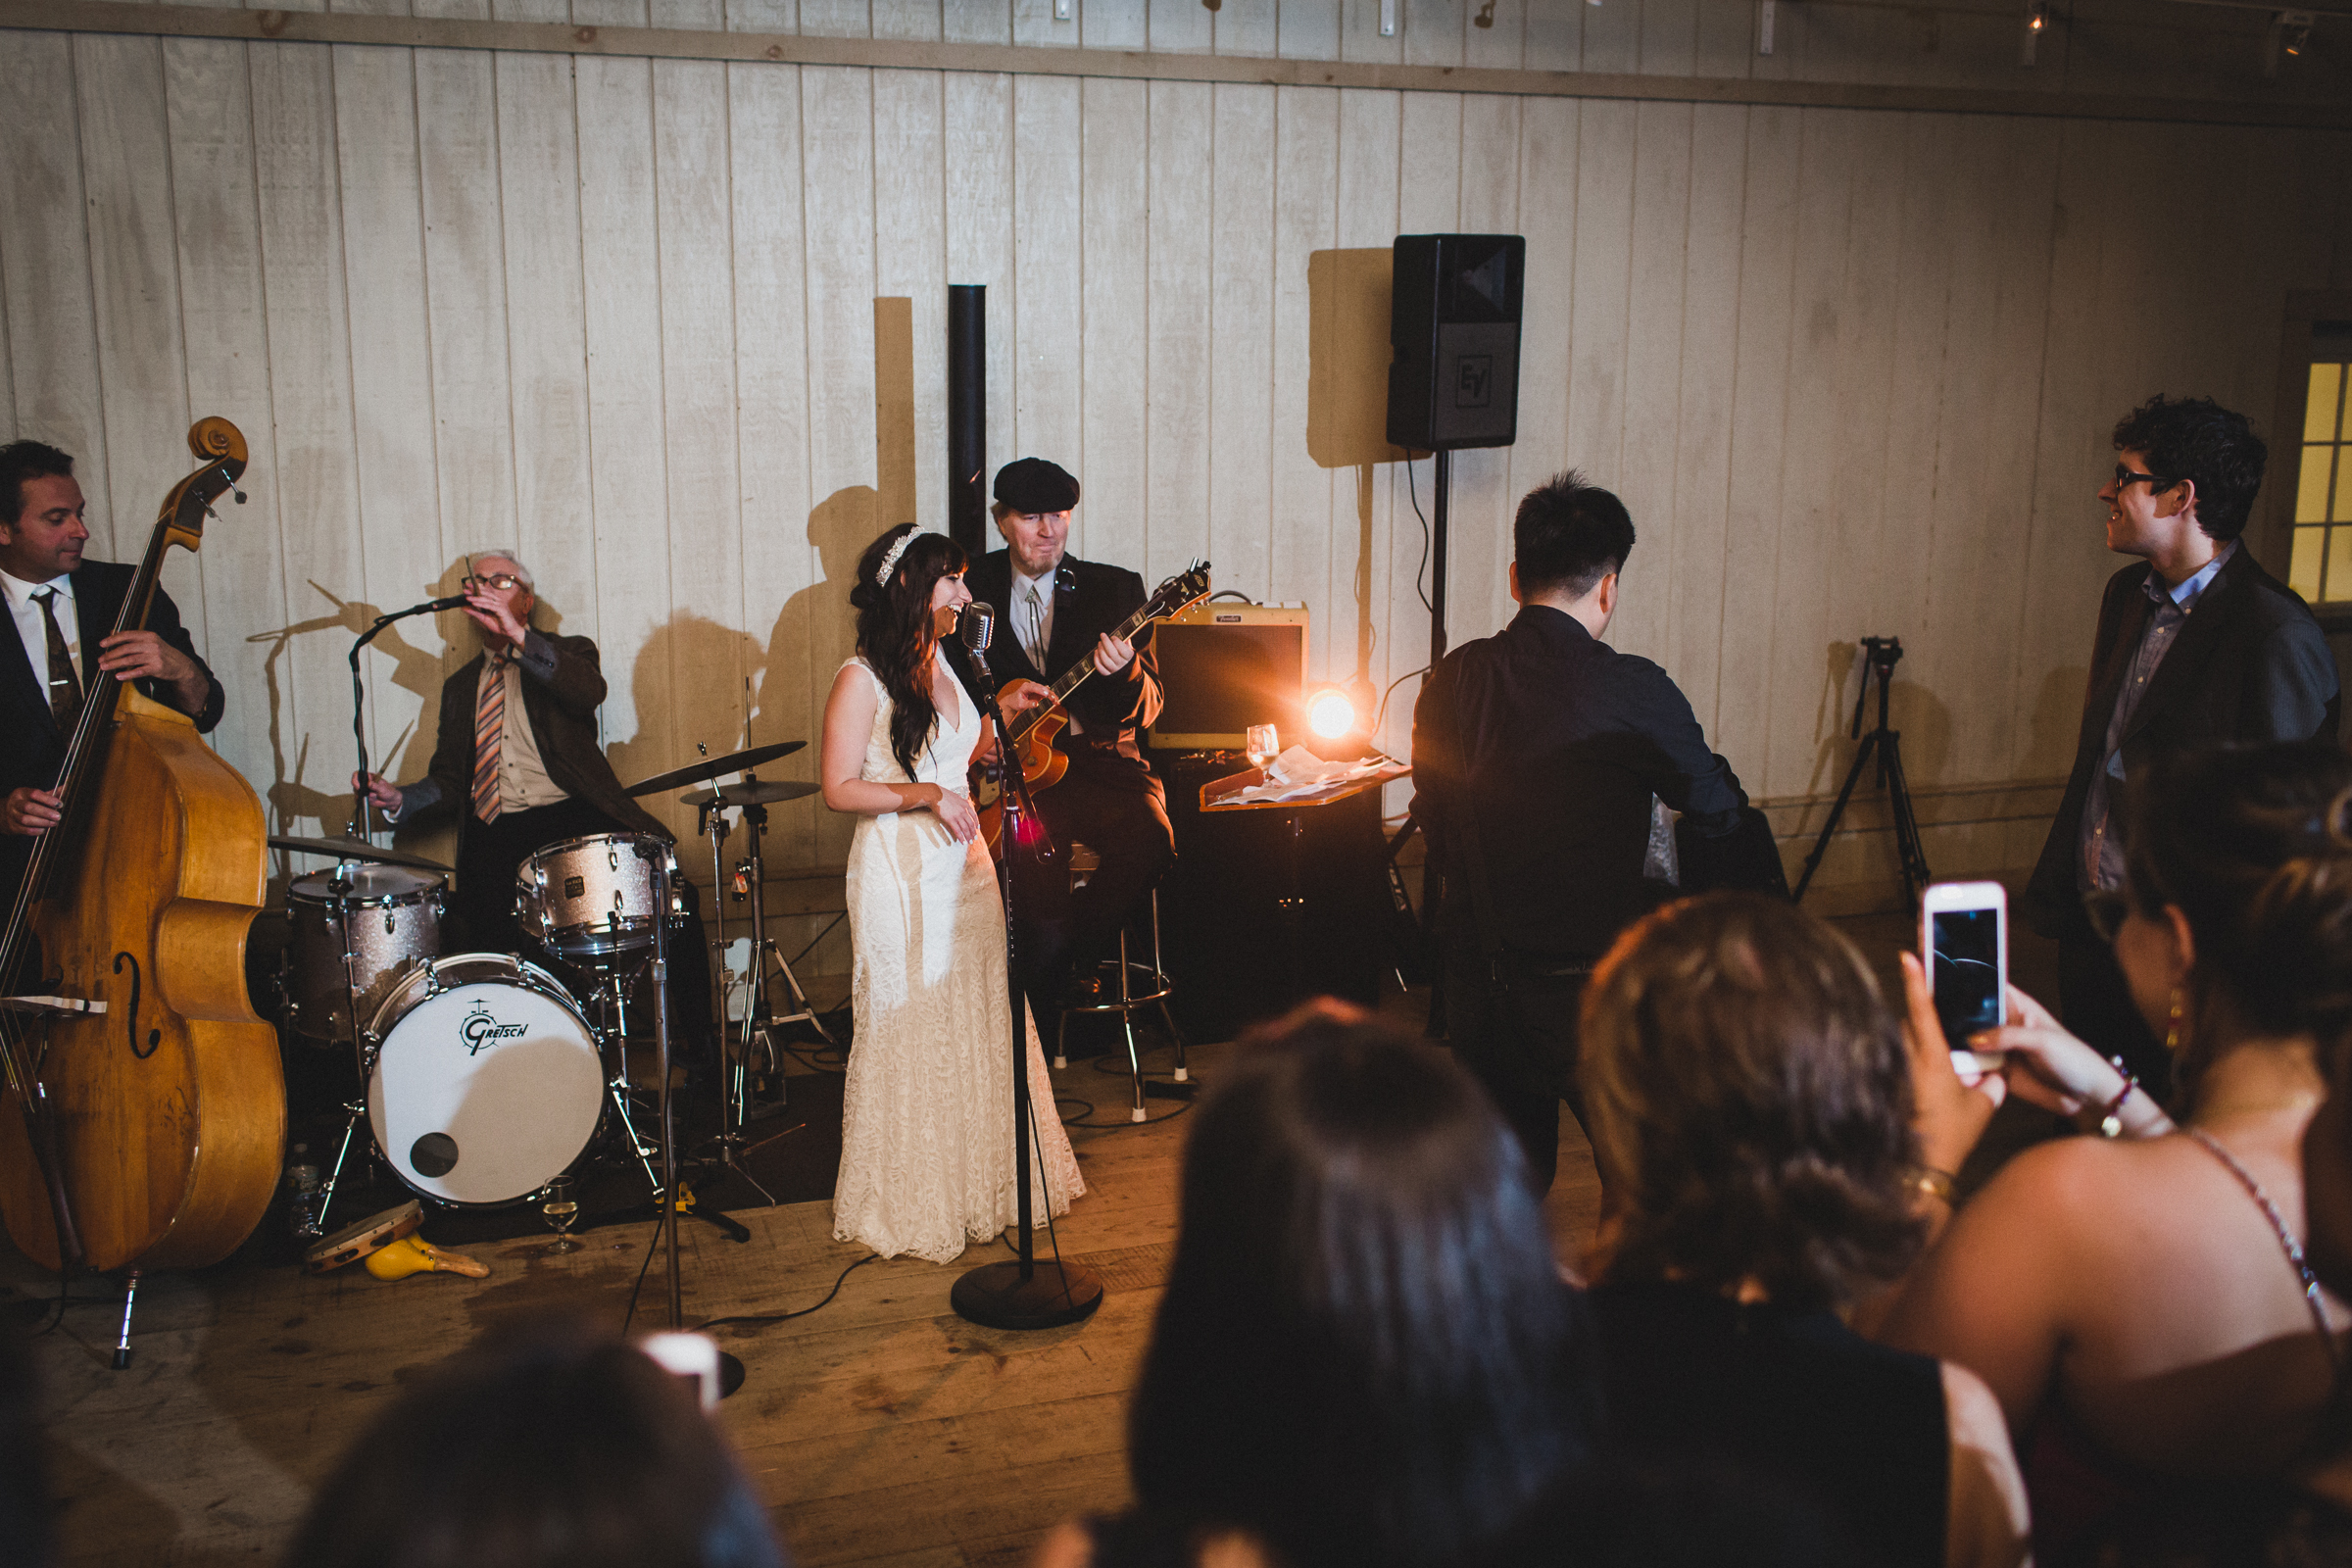 Martha-Clara-Vineyard-Long-Island-Documentary-Wedding-Photographer-99.jpg